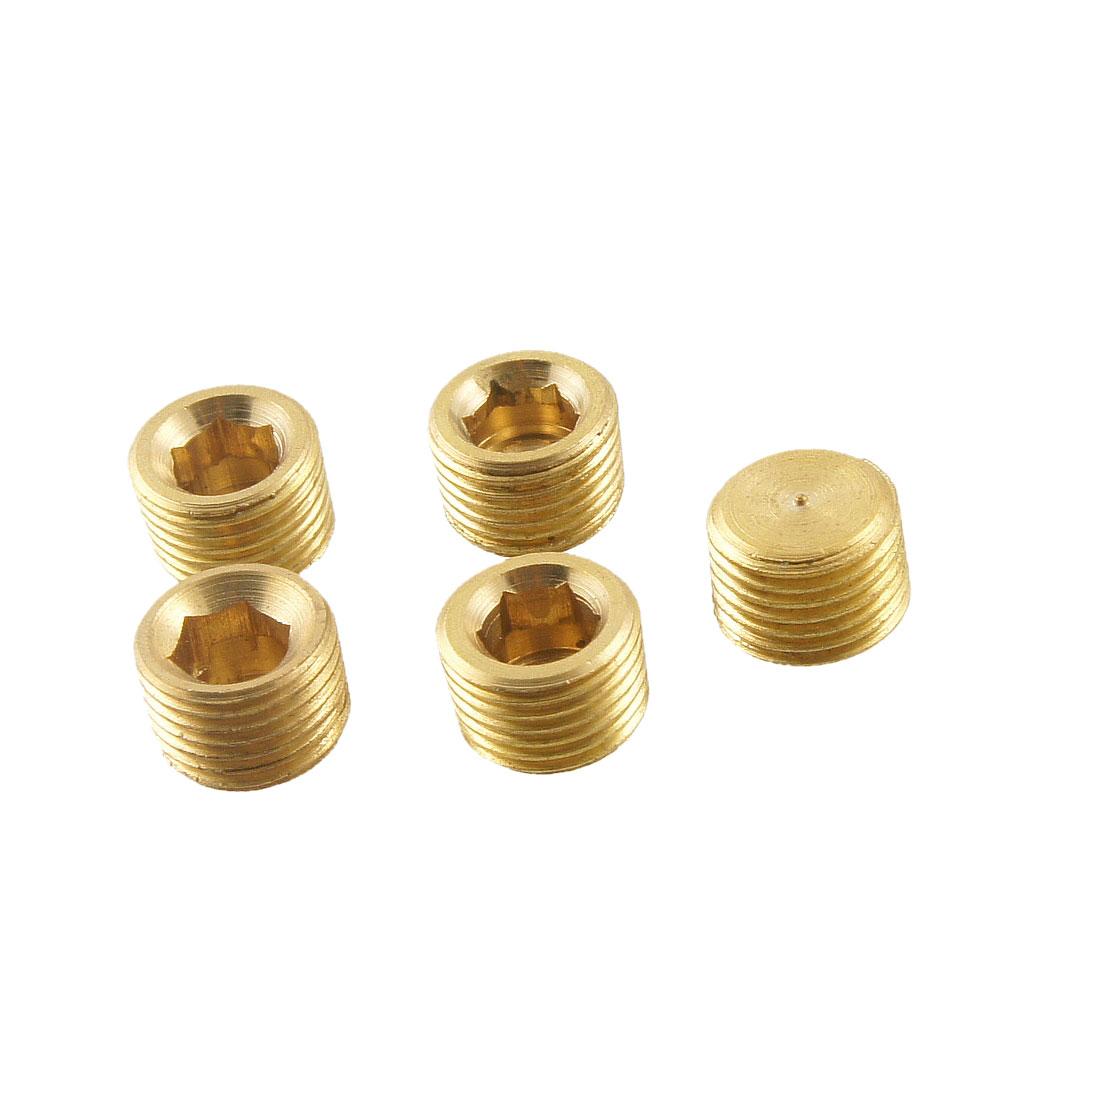 5 Pcs Metal Internal Hex Head Socket 9.5mm Thread Diameter Pipe Connector Fitting